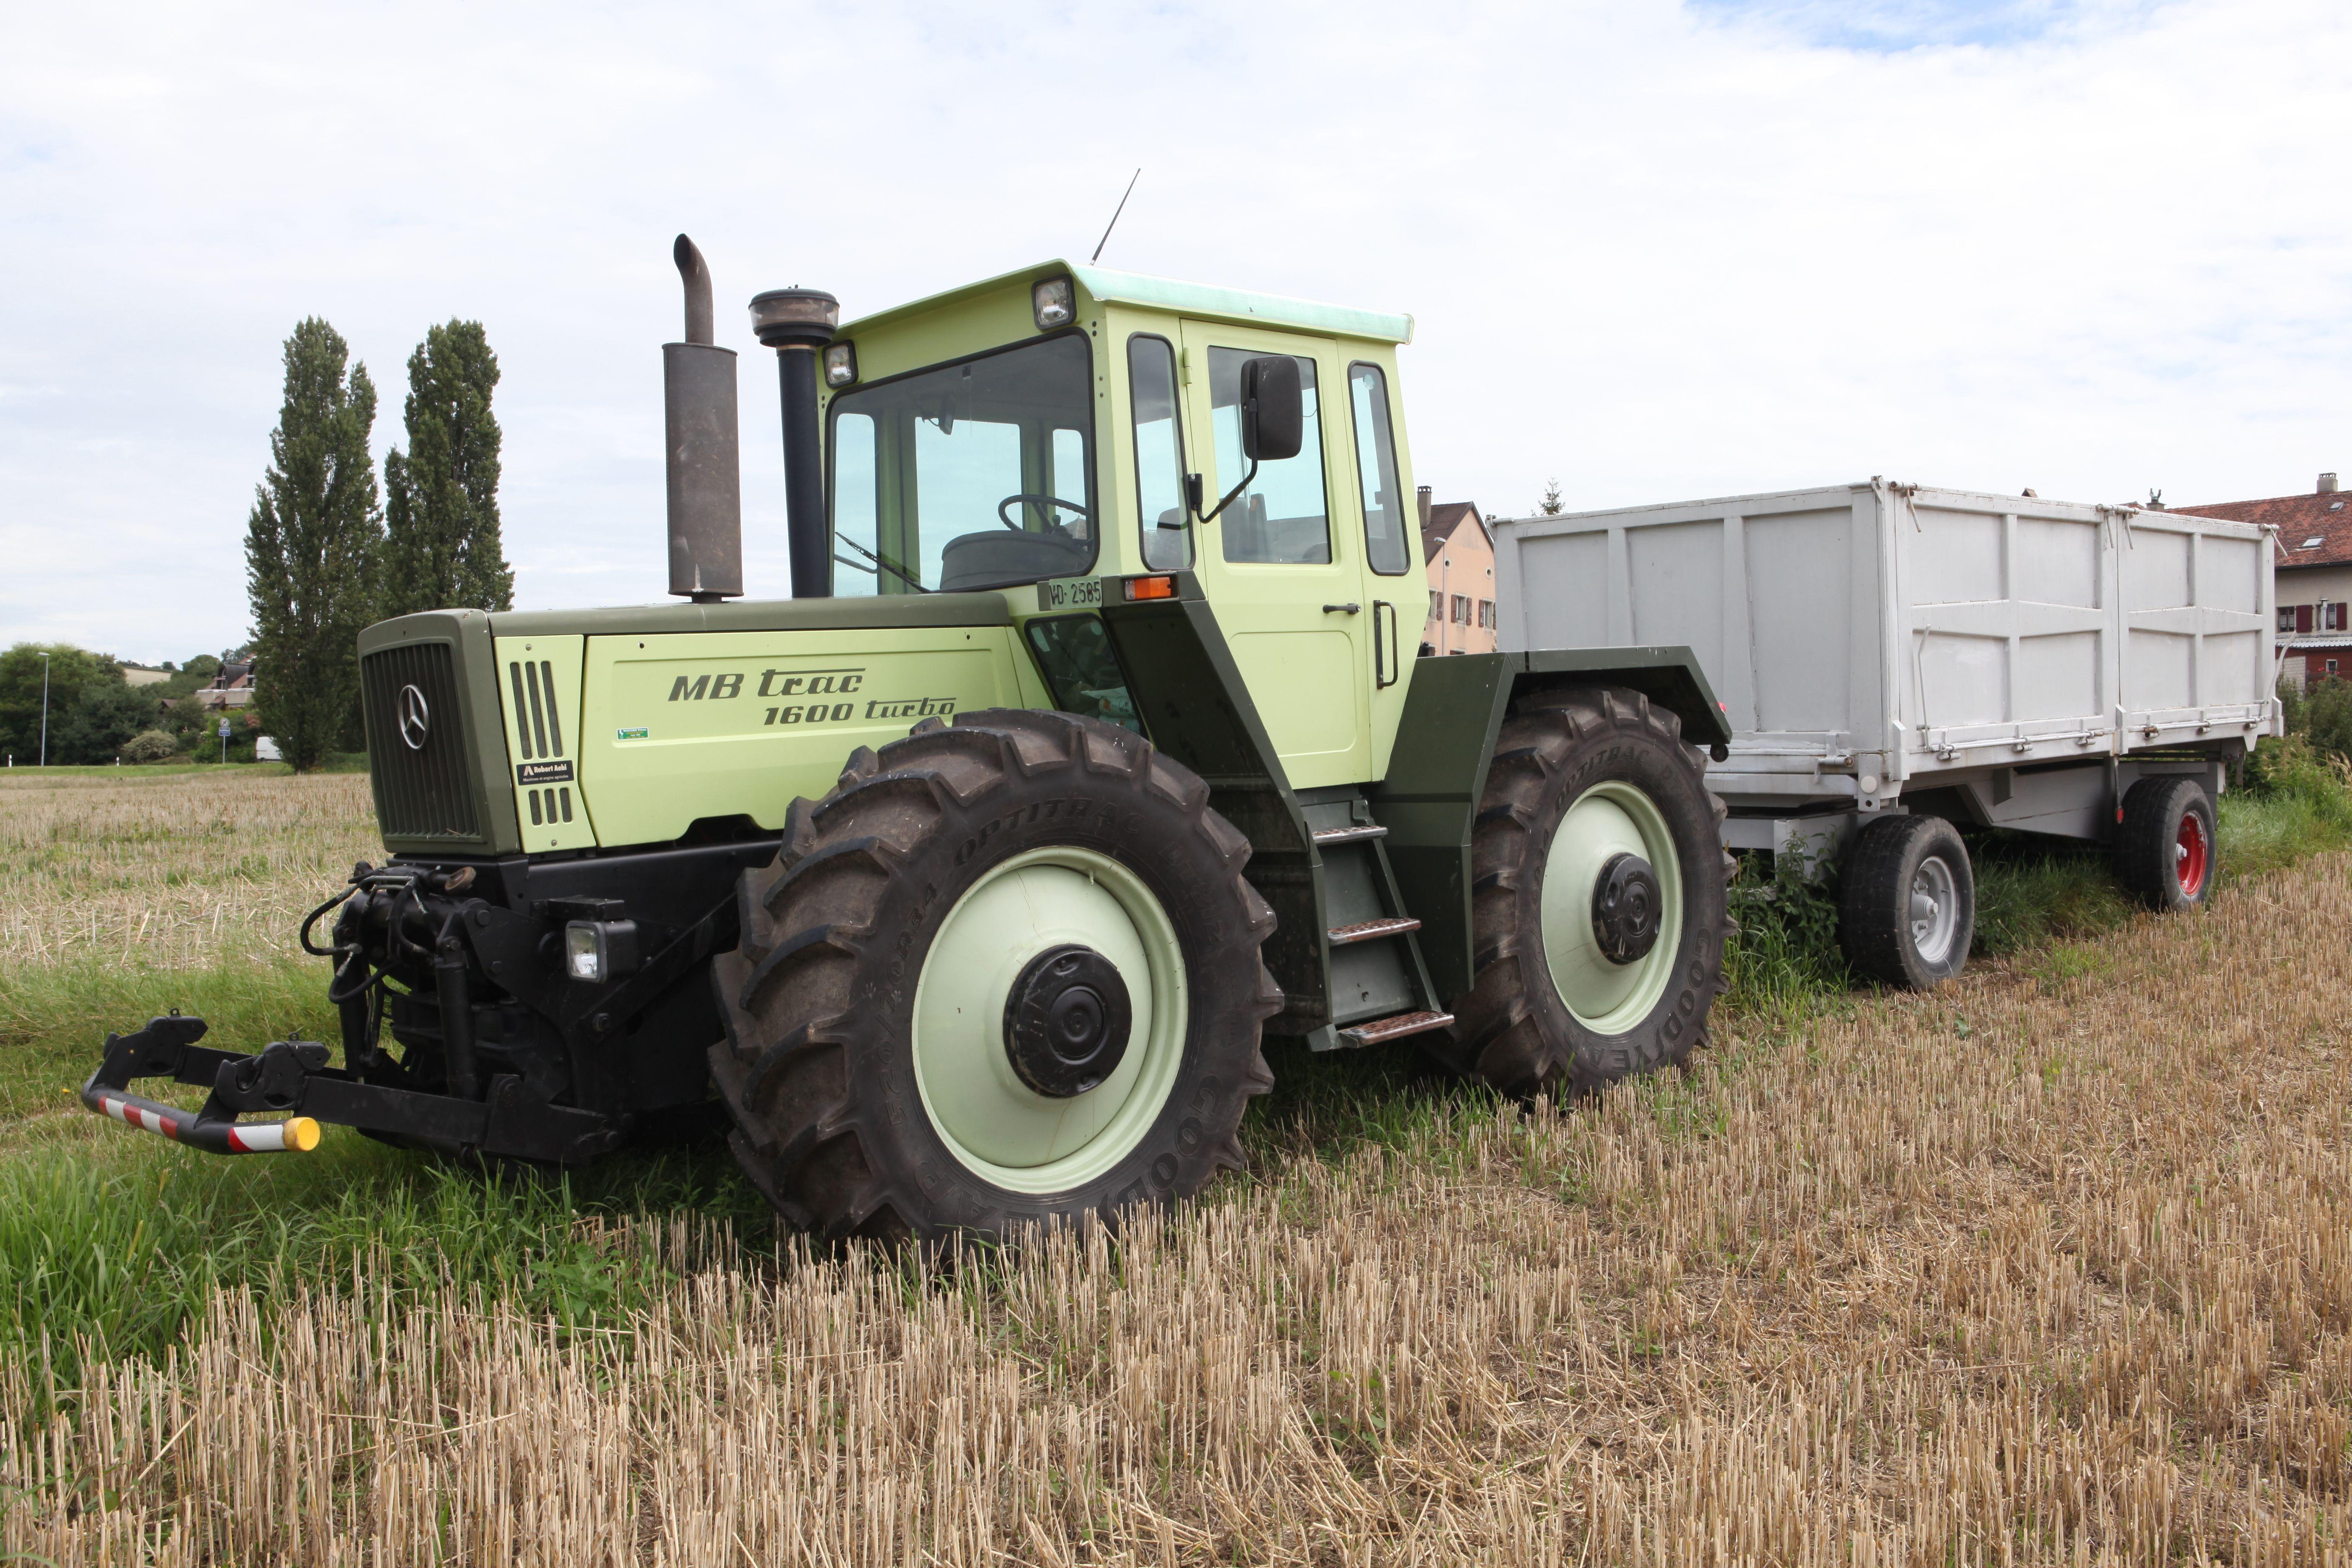 mercedes benz mb trac 1600 turbo tractor mania. Black Bedroom Furniture Sets. Home Design Ideas